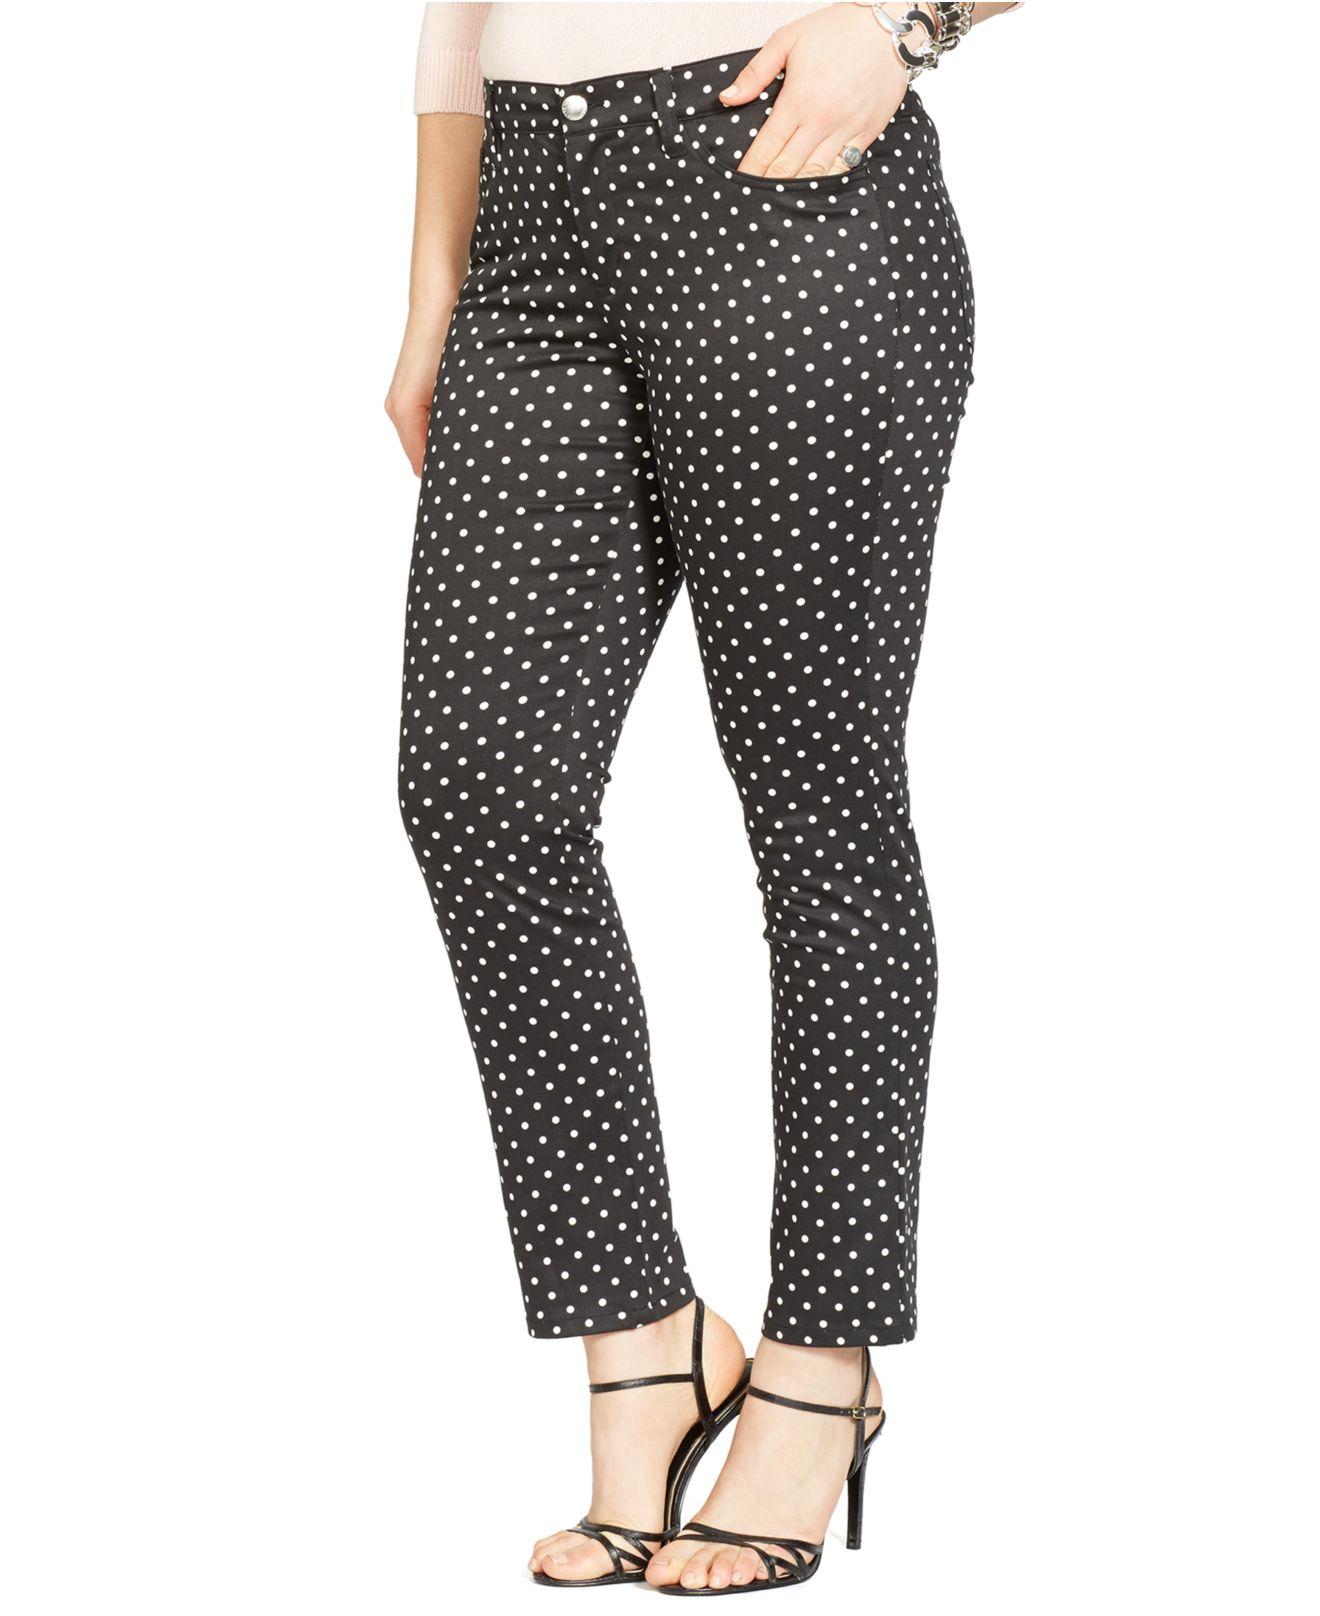 Lauren By Ralph Lauren Plus Size Polka Dot Skinny Ankle